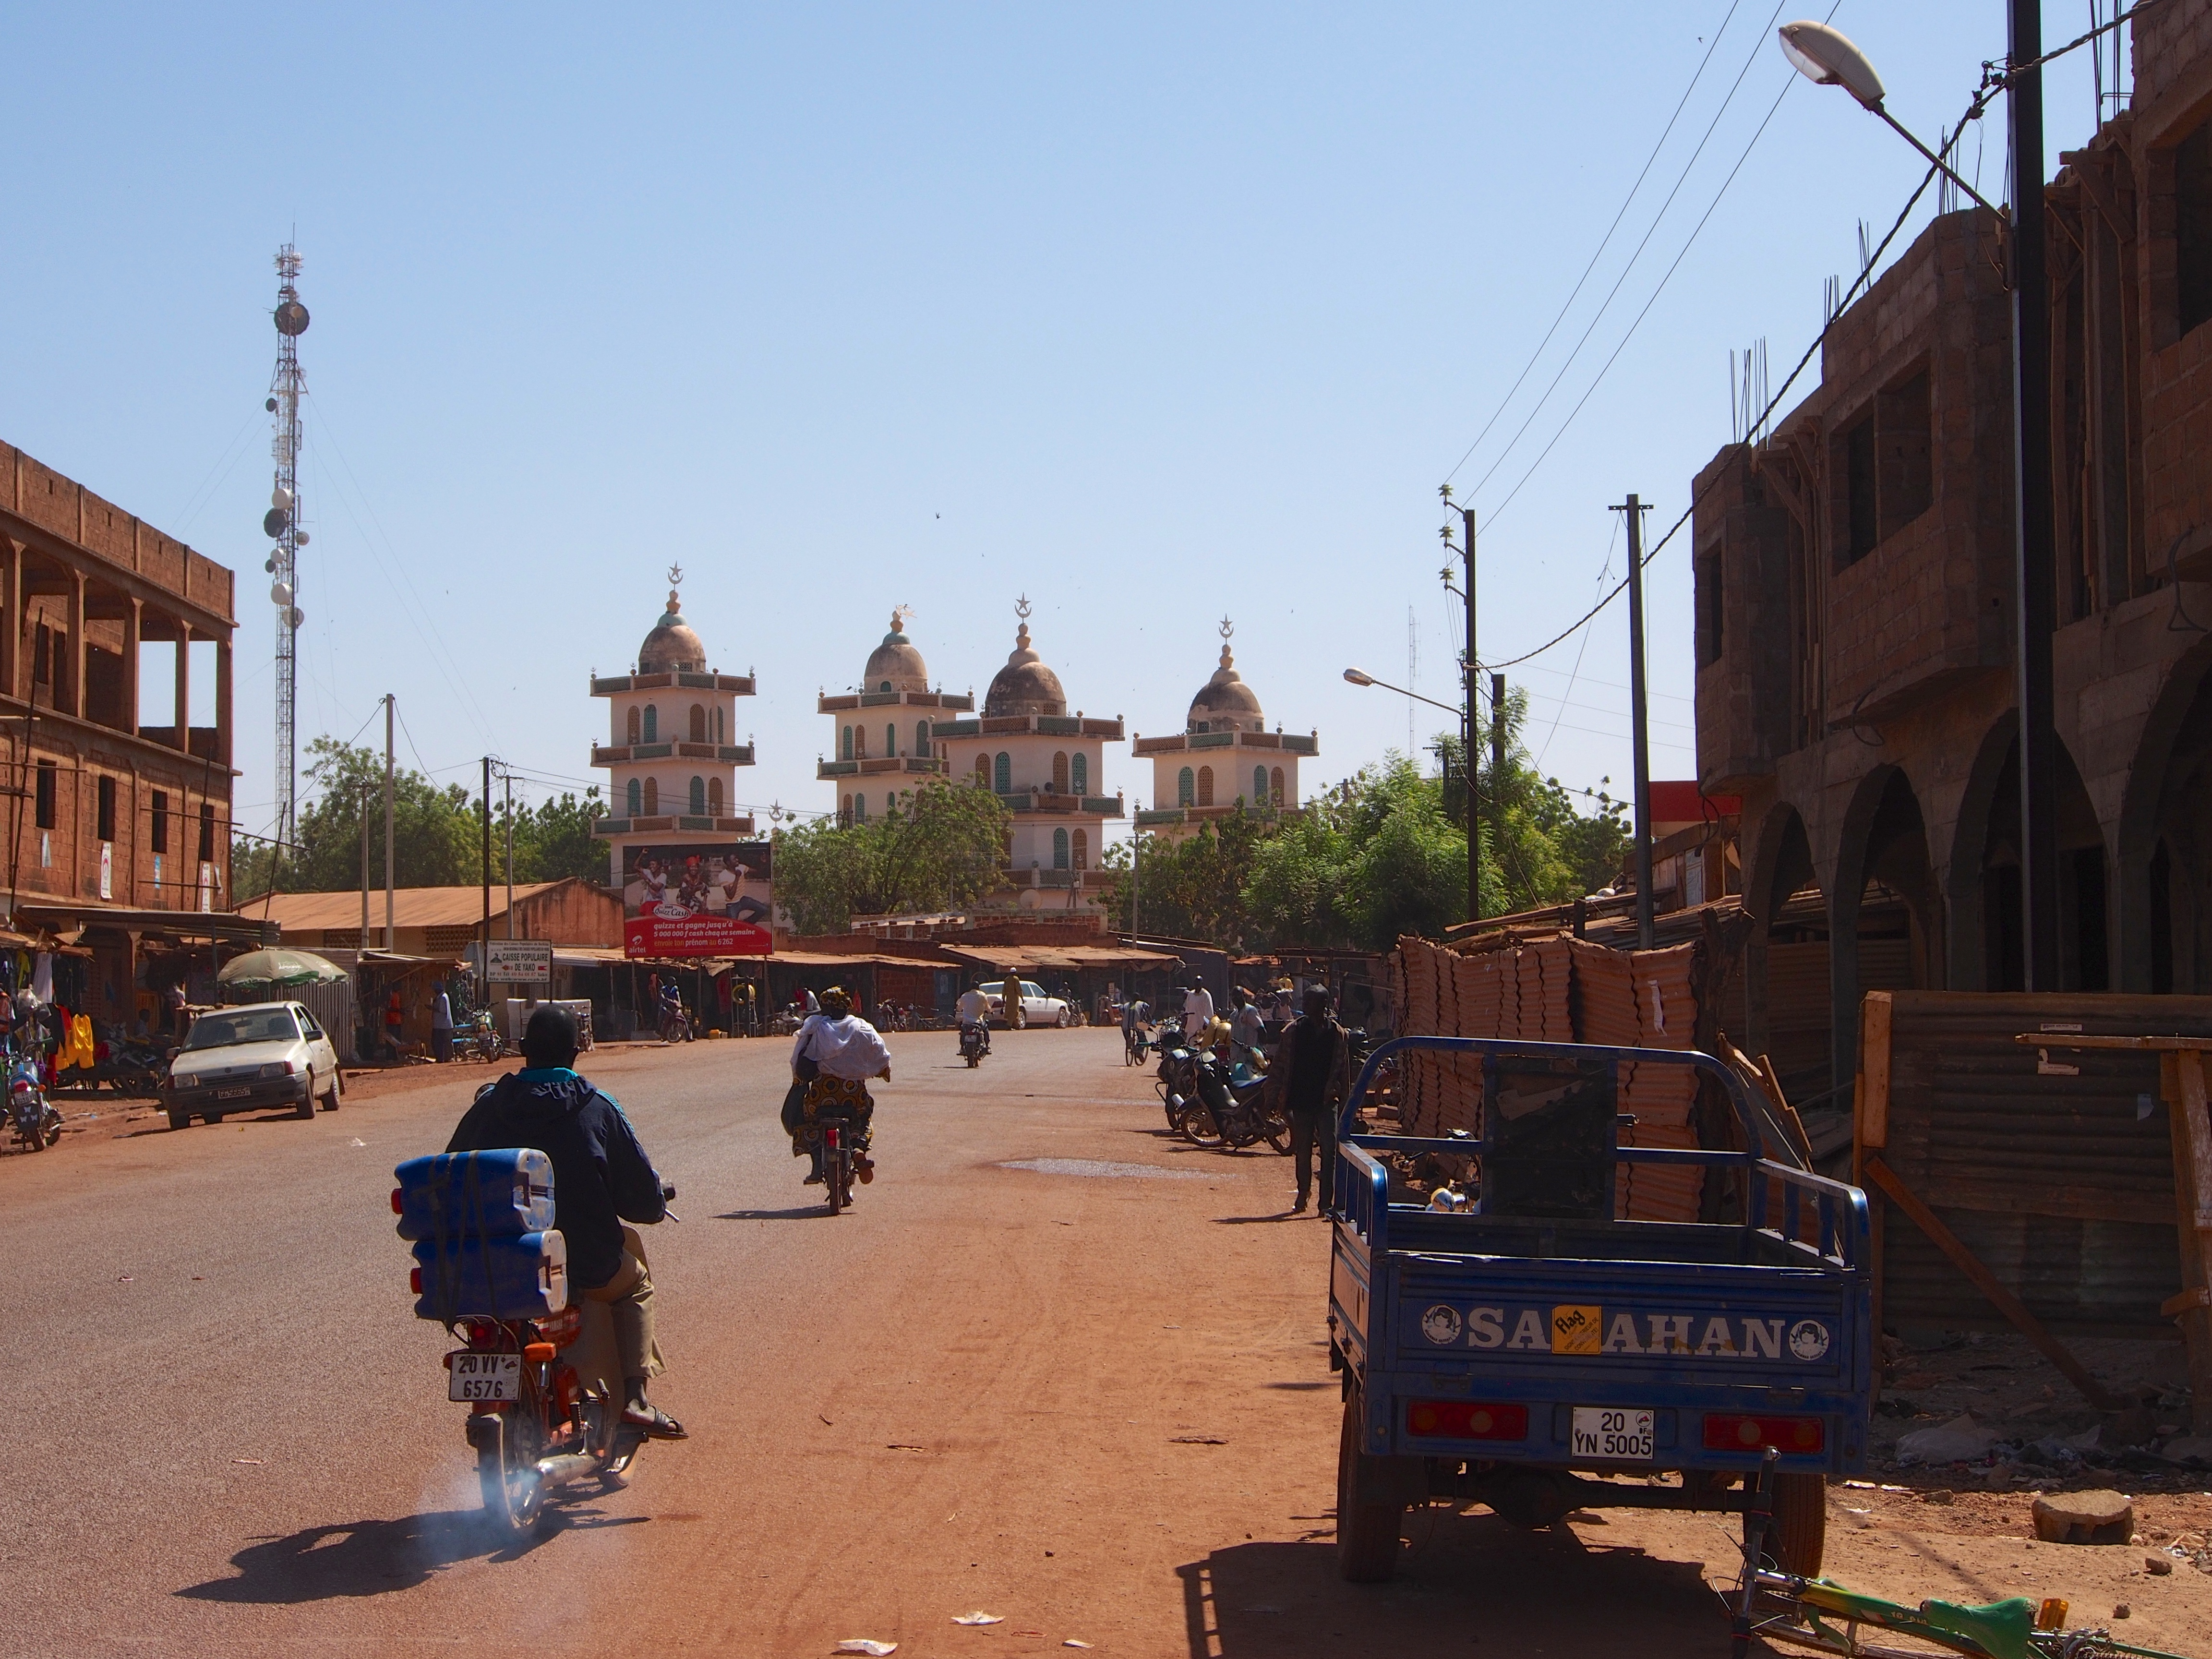 Yako, Burkina Faso